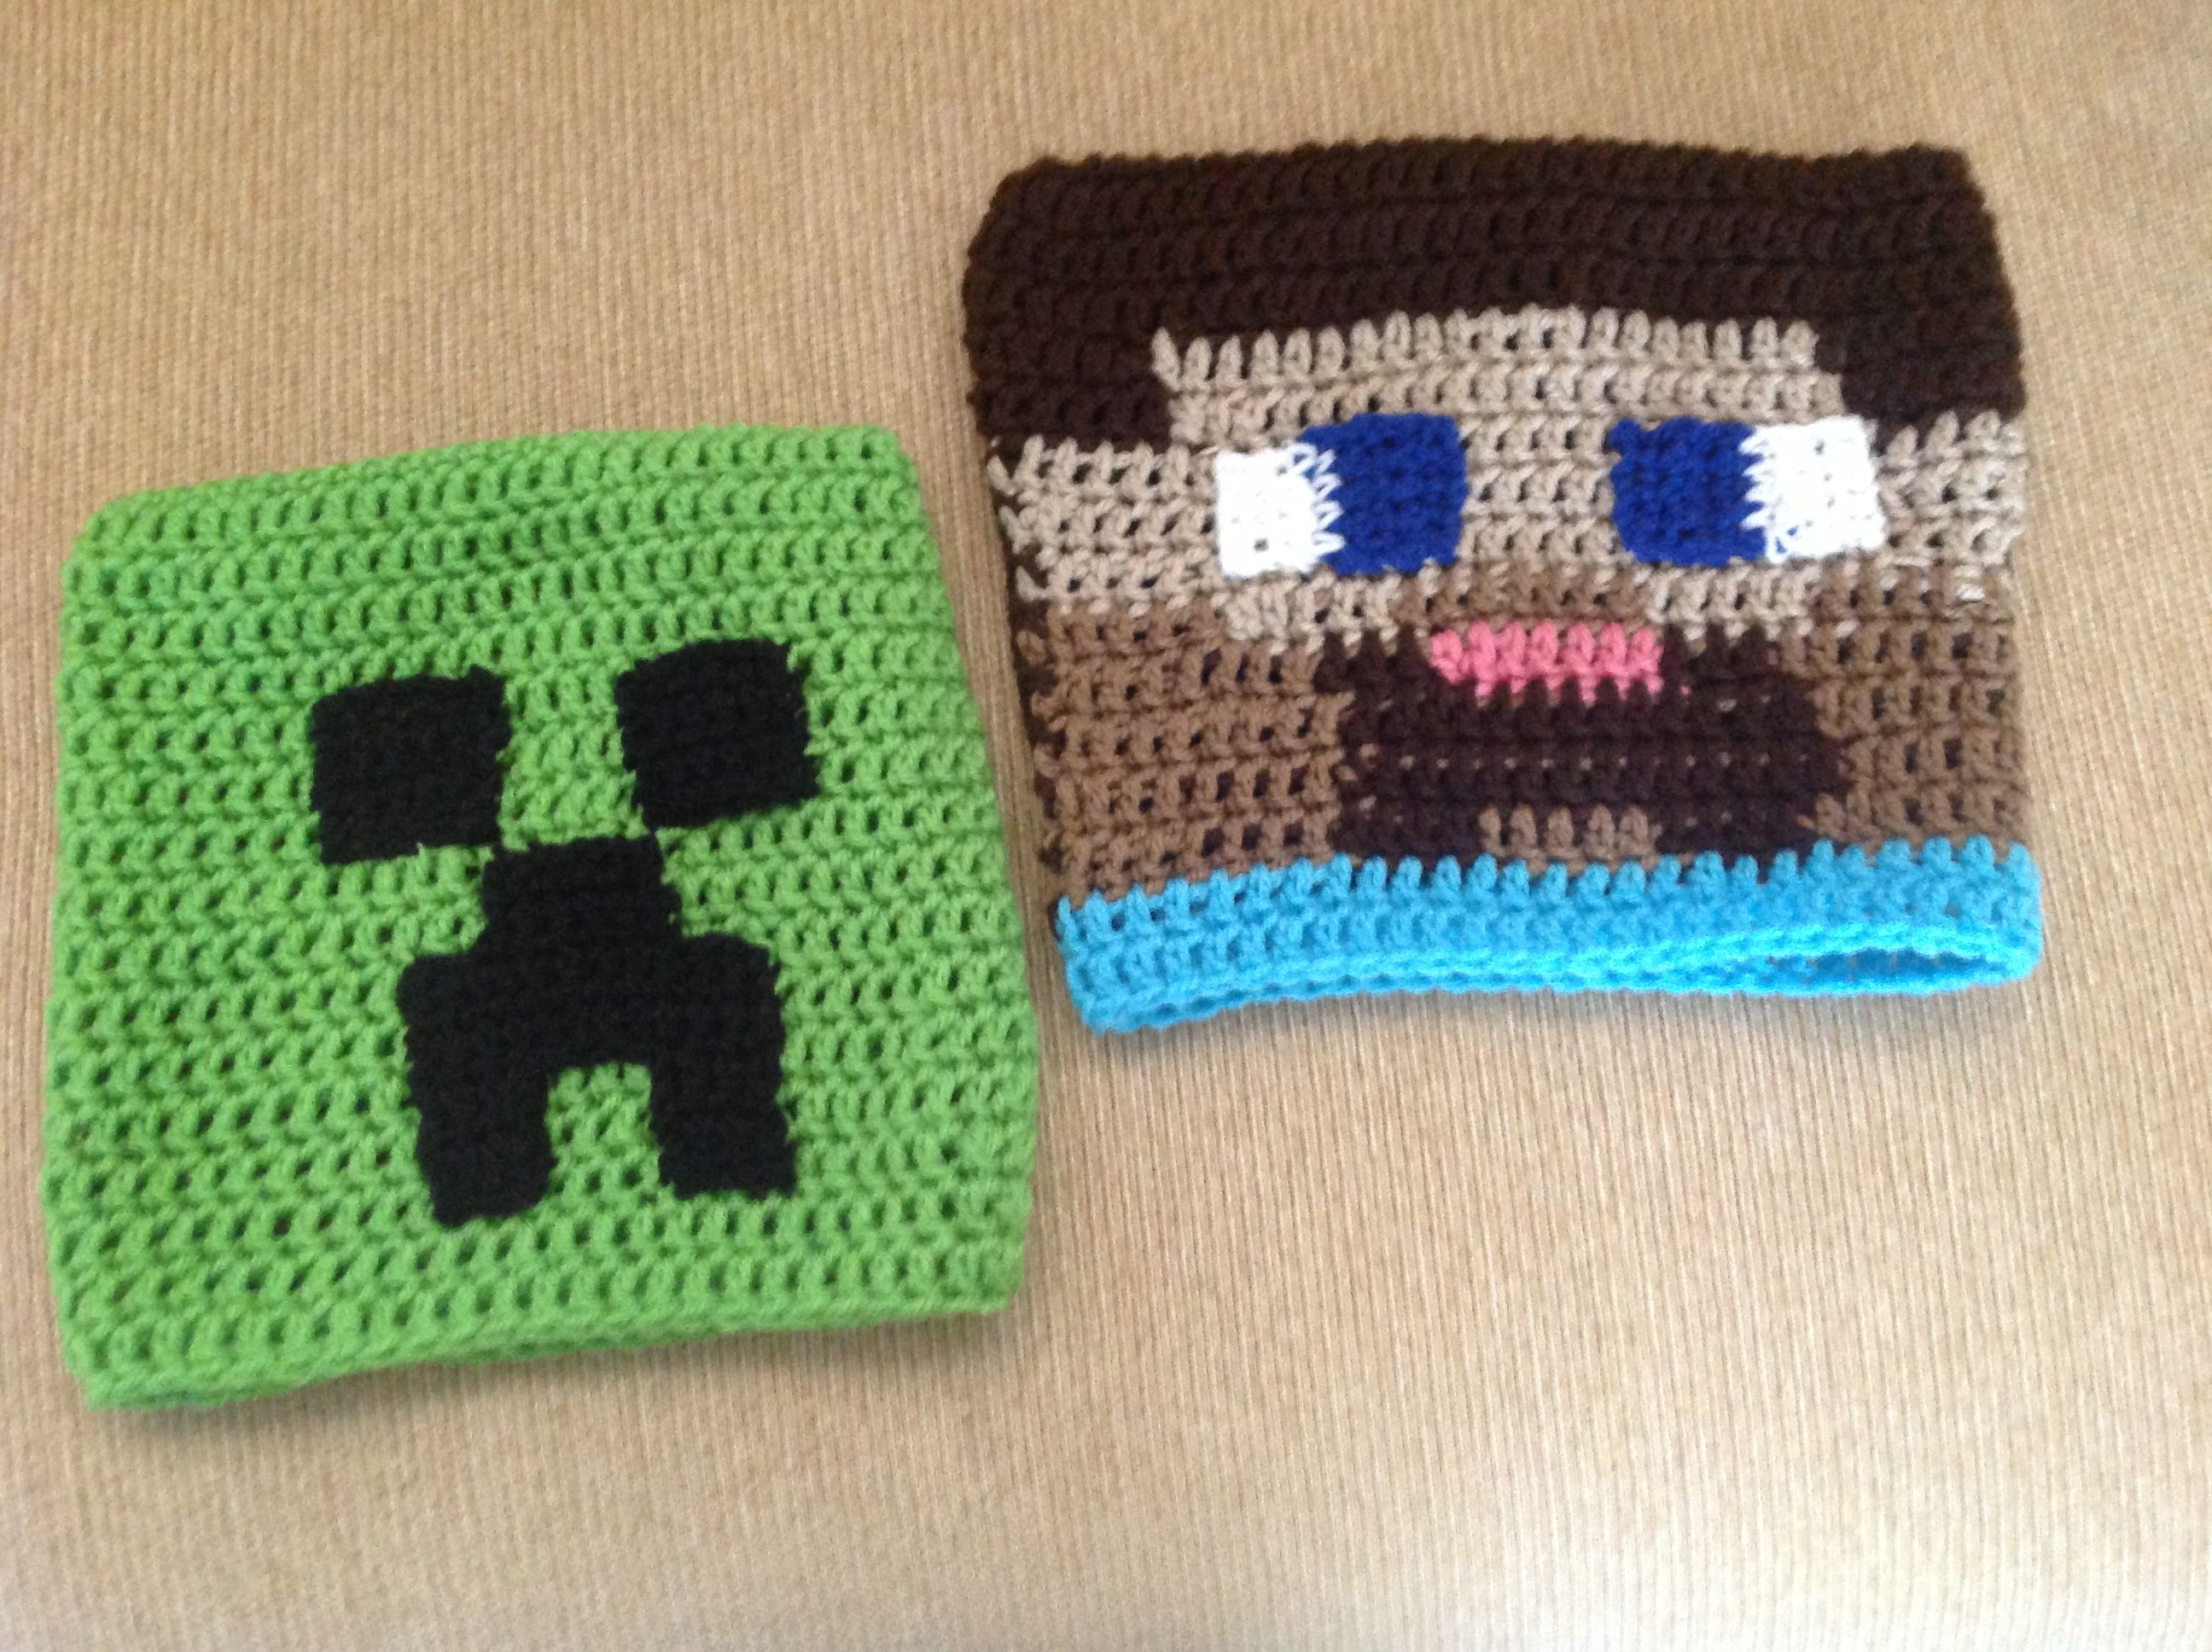 Smartapple Creations - amigurumi and crochet: Minecraft Steve vs ... | 1936x2592